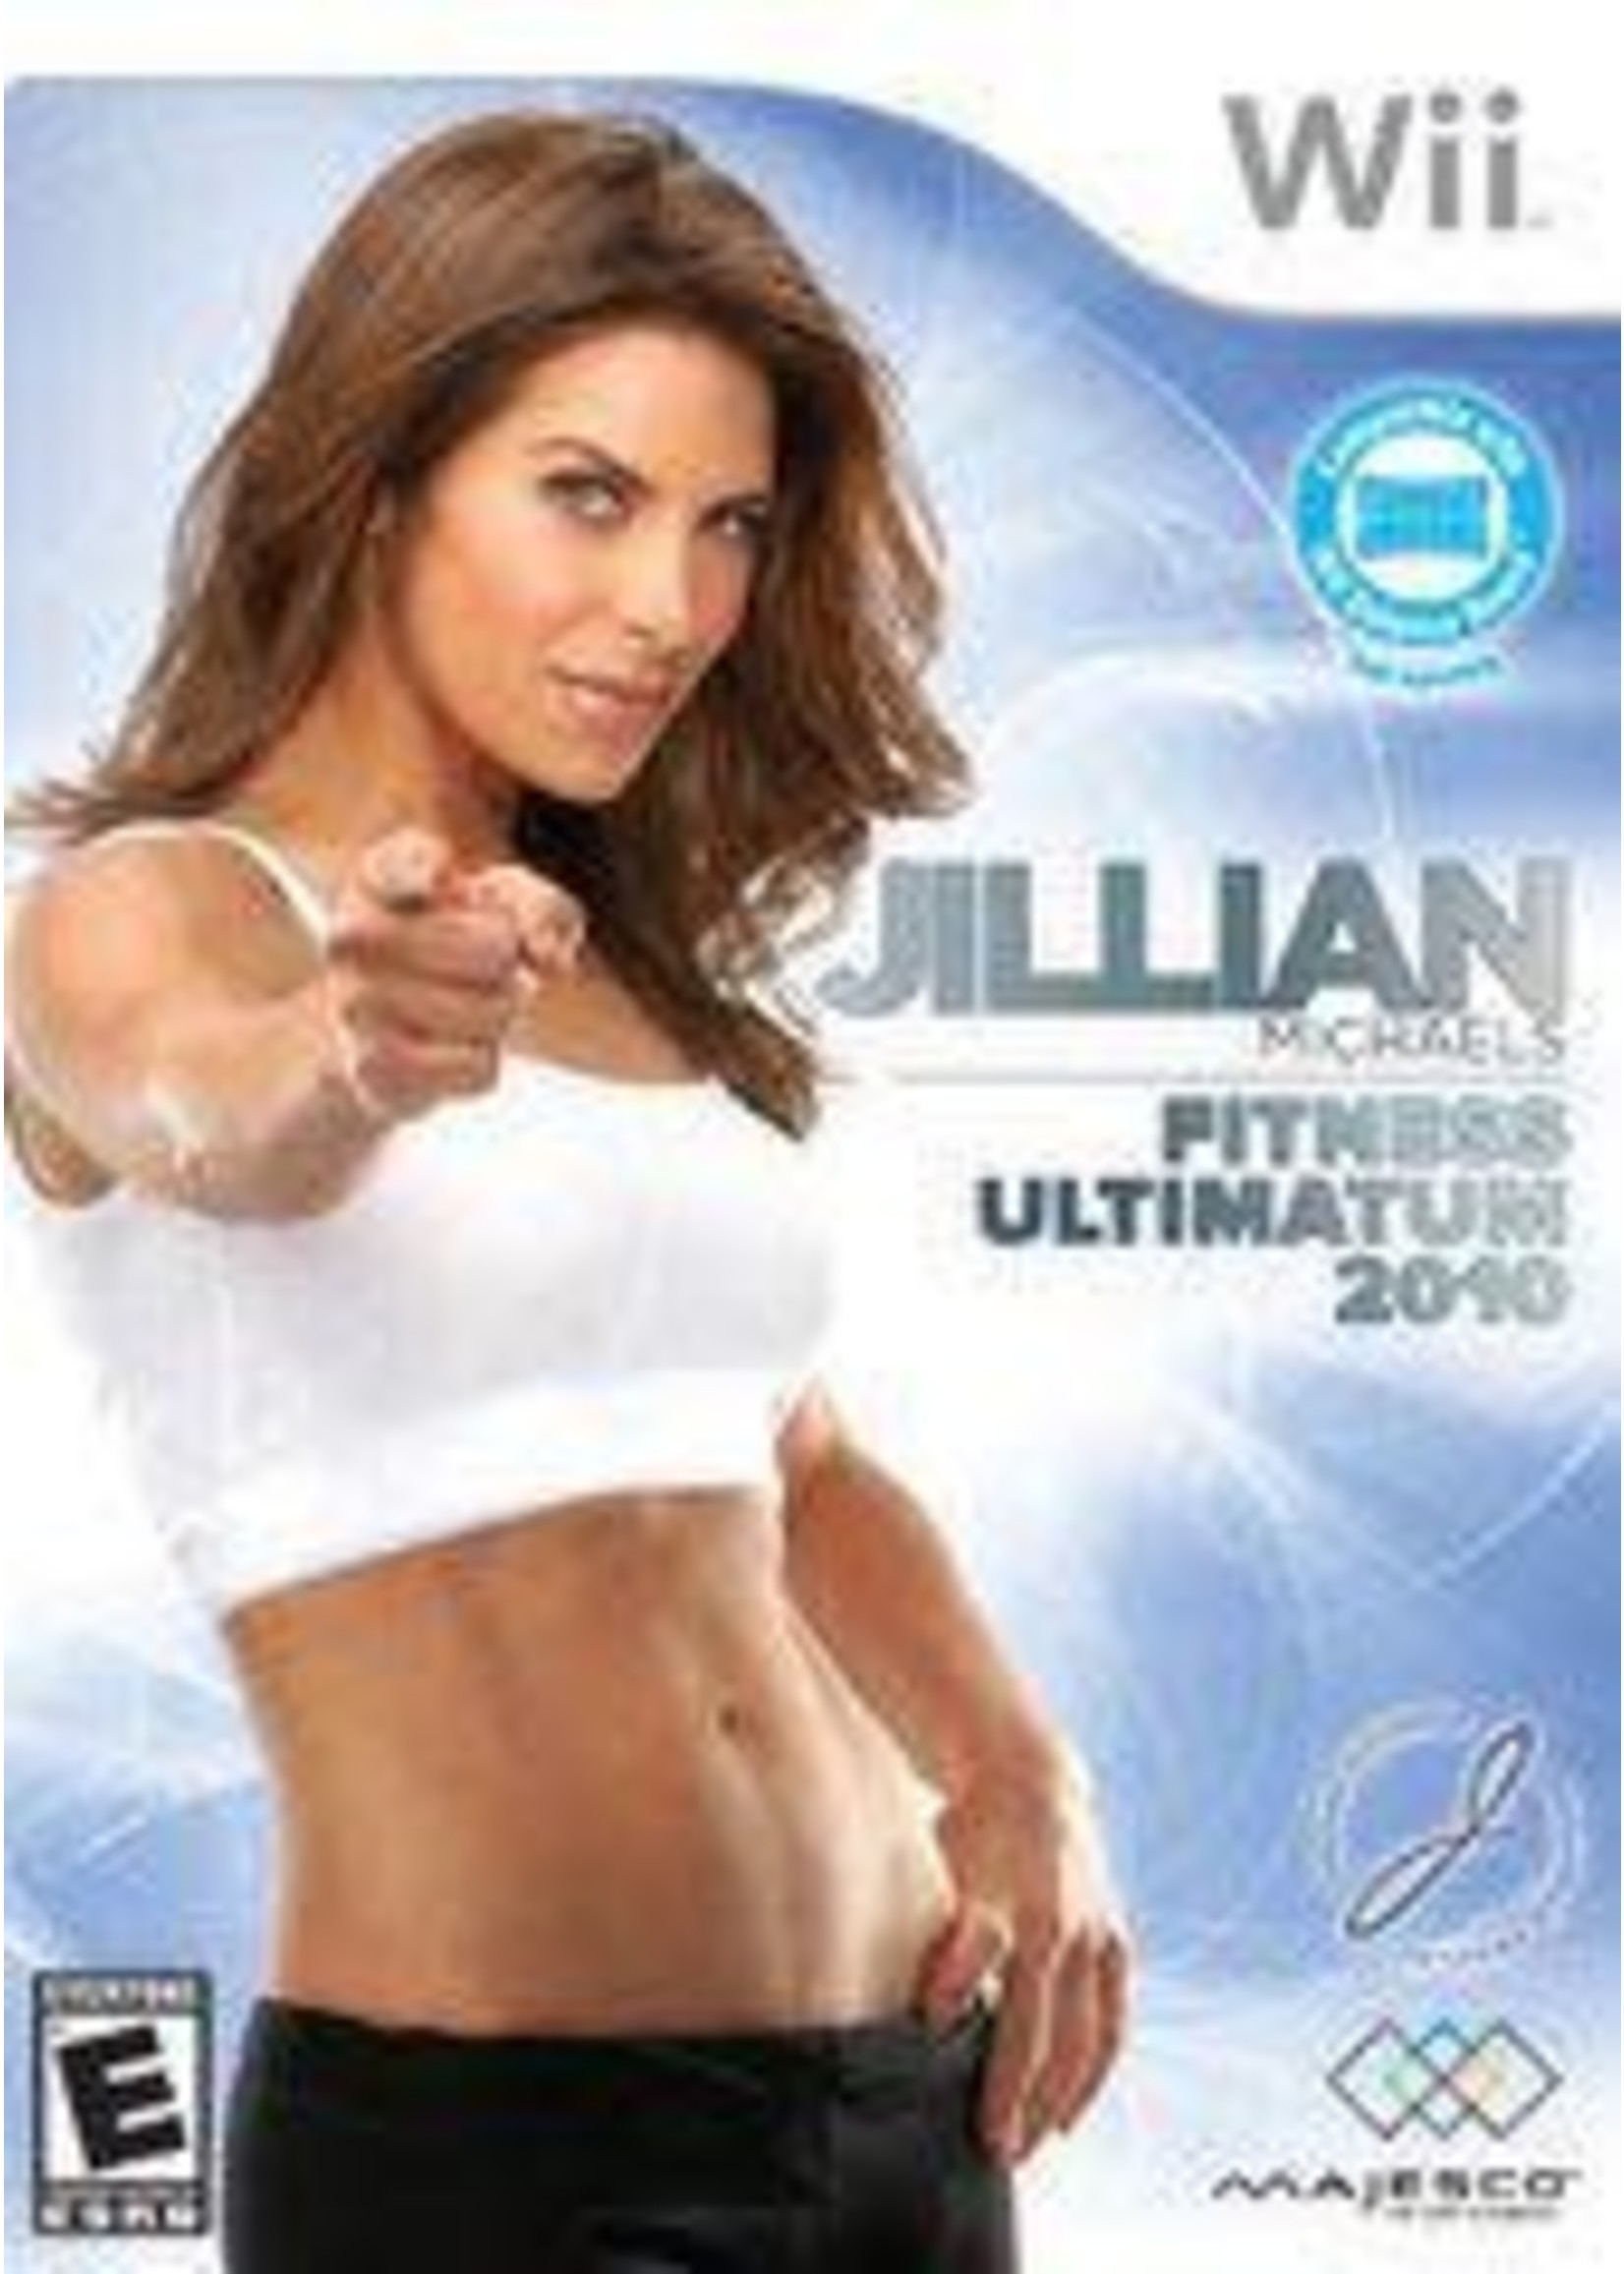 Jillian Michaels' Fitness Ultimatum 2010 Wii